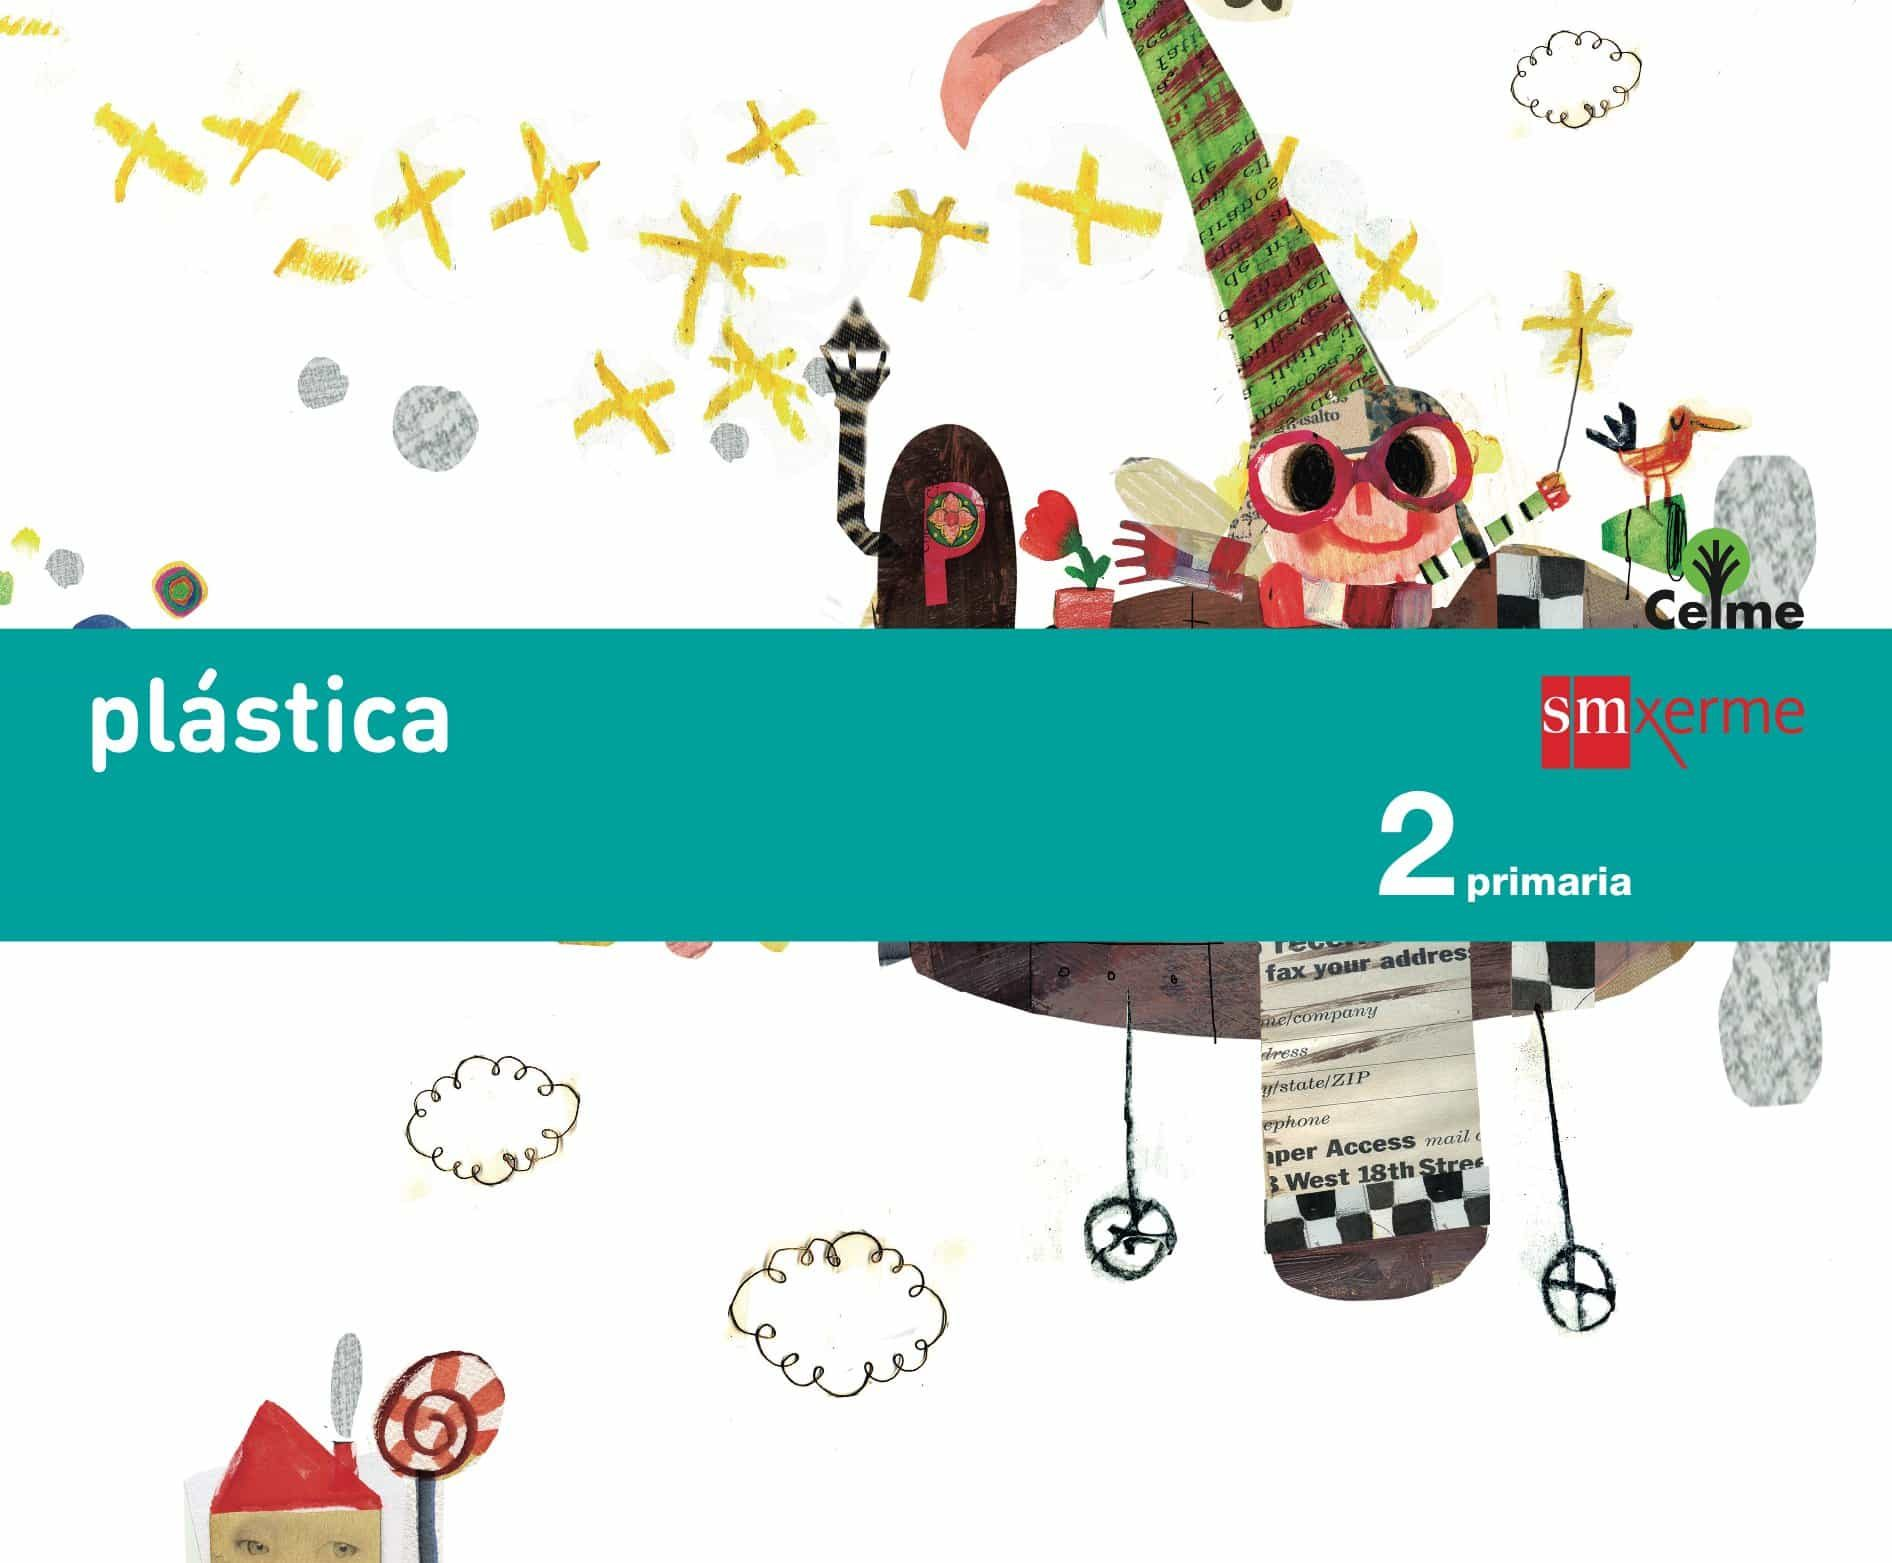 Plástica 2º Educacion Primaria Celme Ed 2015 - Vv.aa.